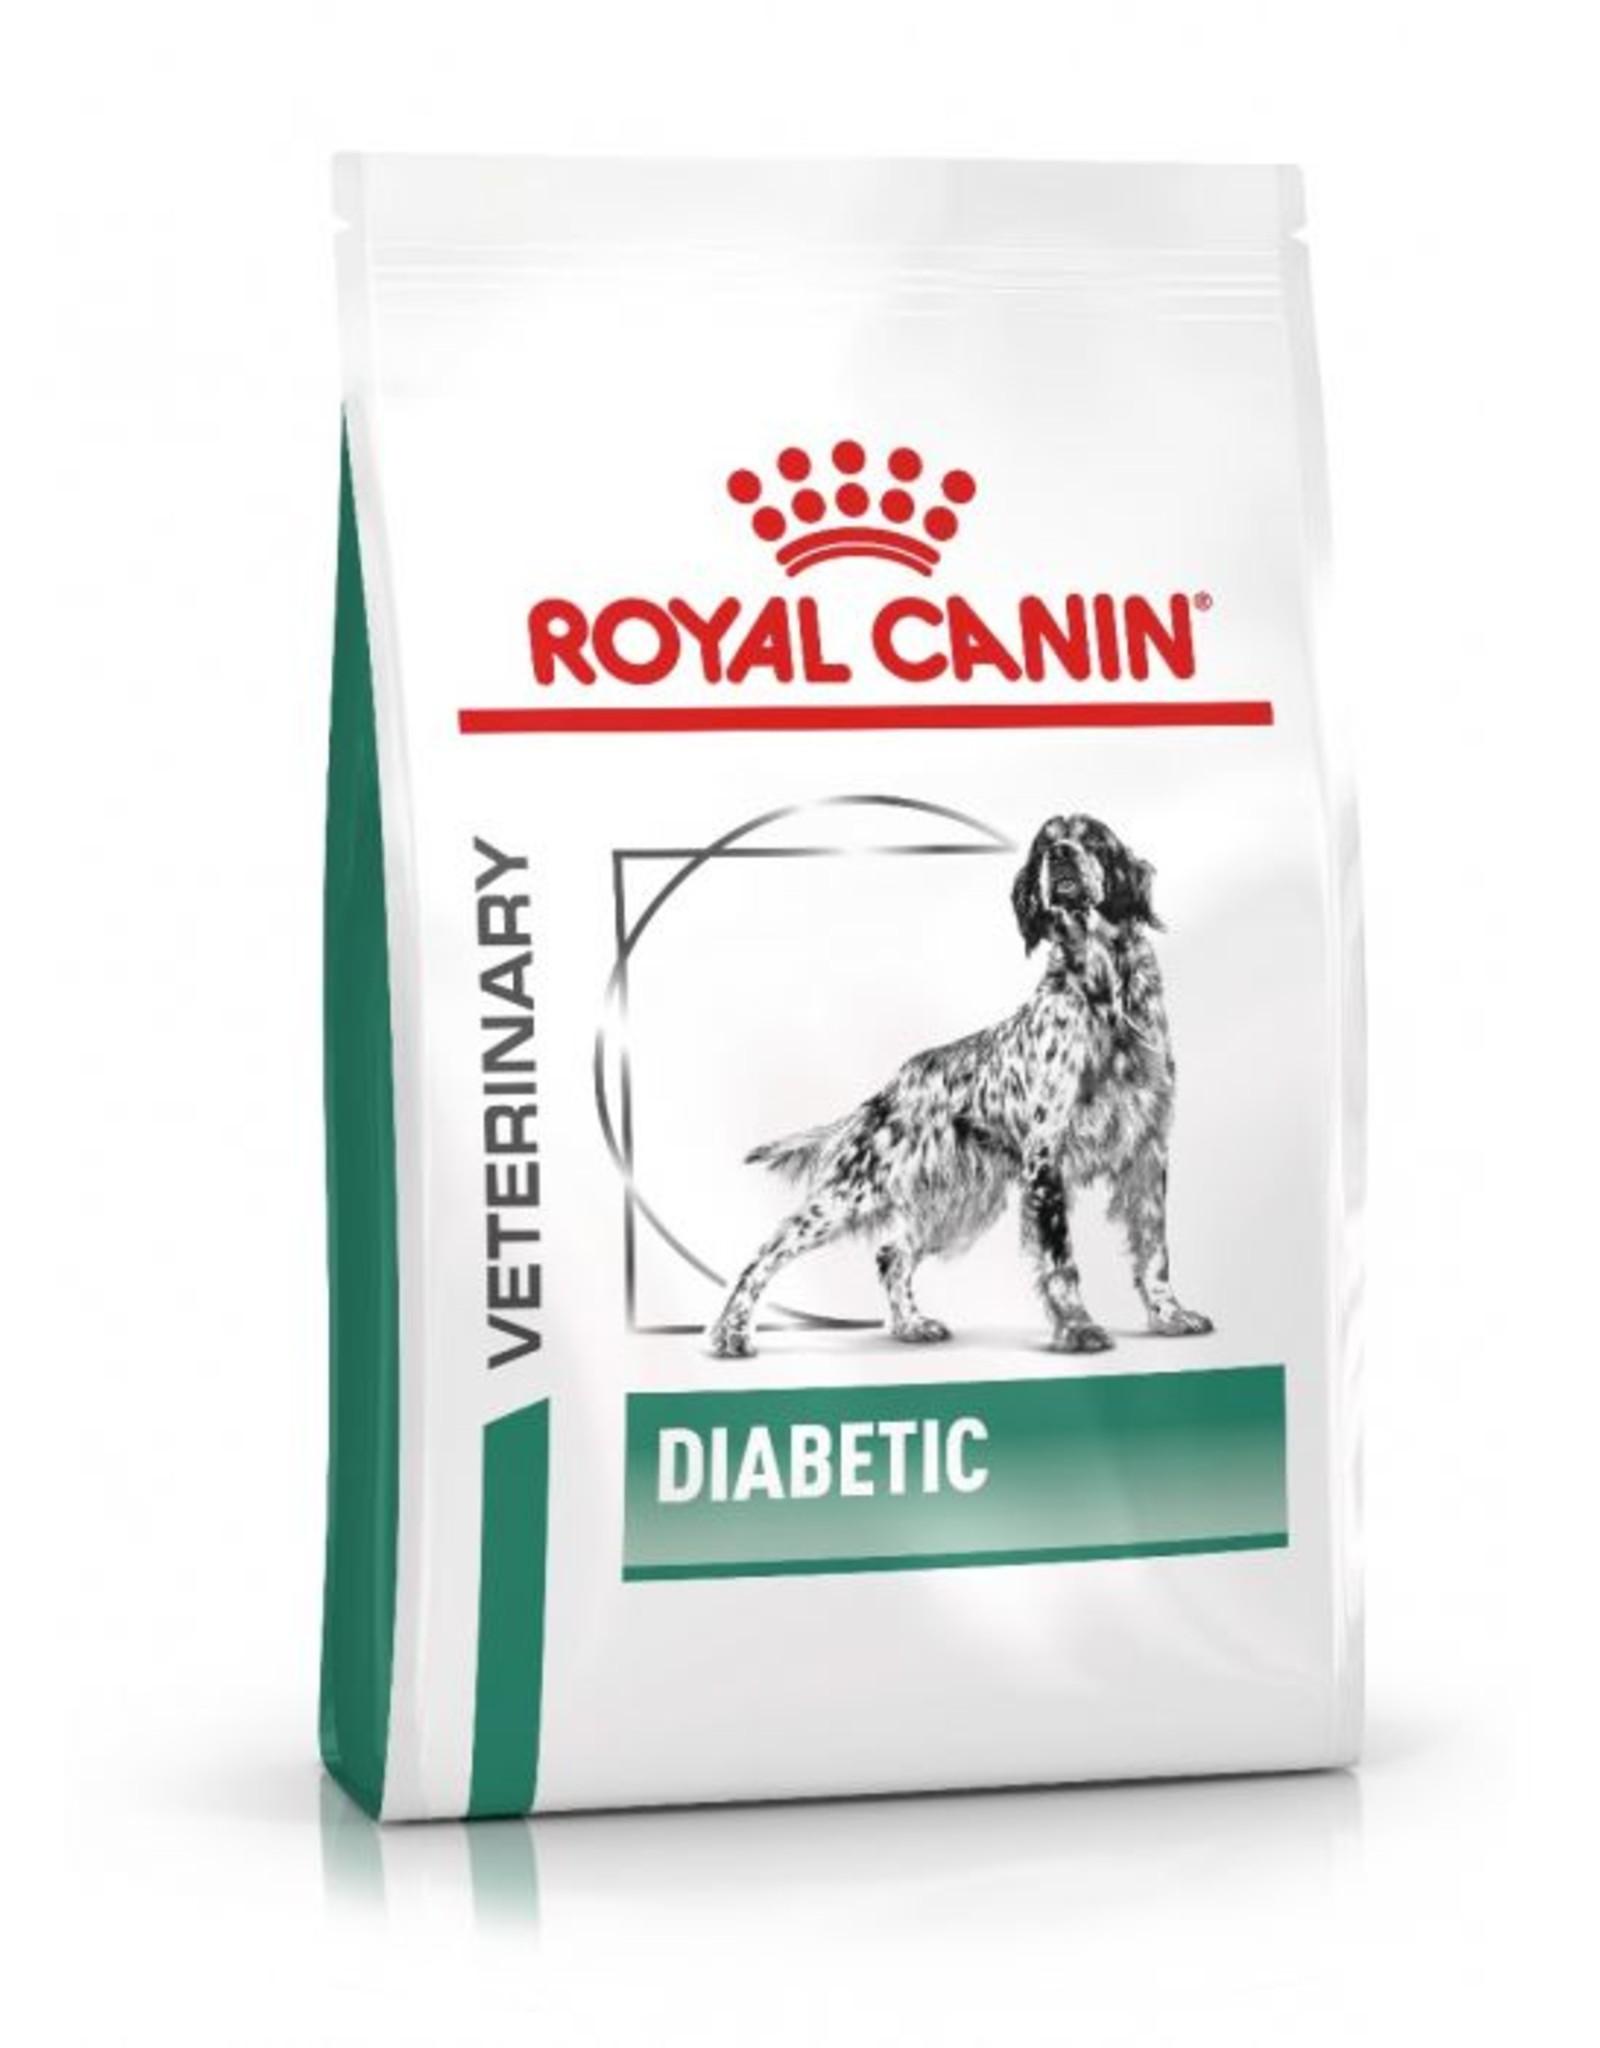 Royal Canin Royal Canin Vdiet Diabetic Hond 12kg